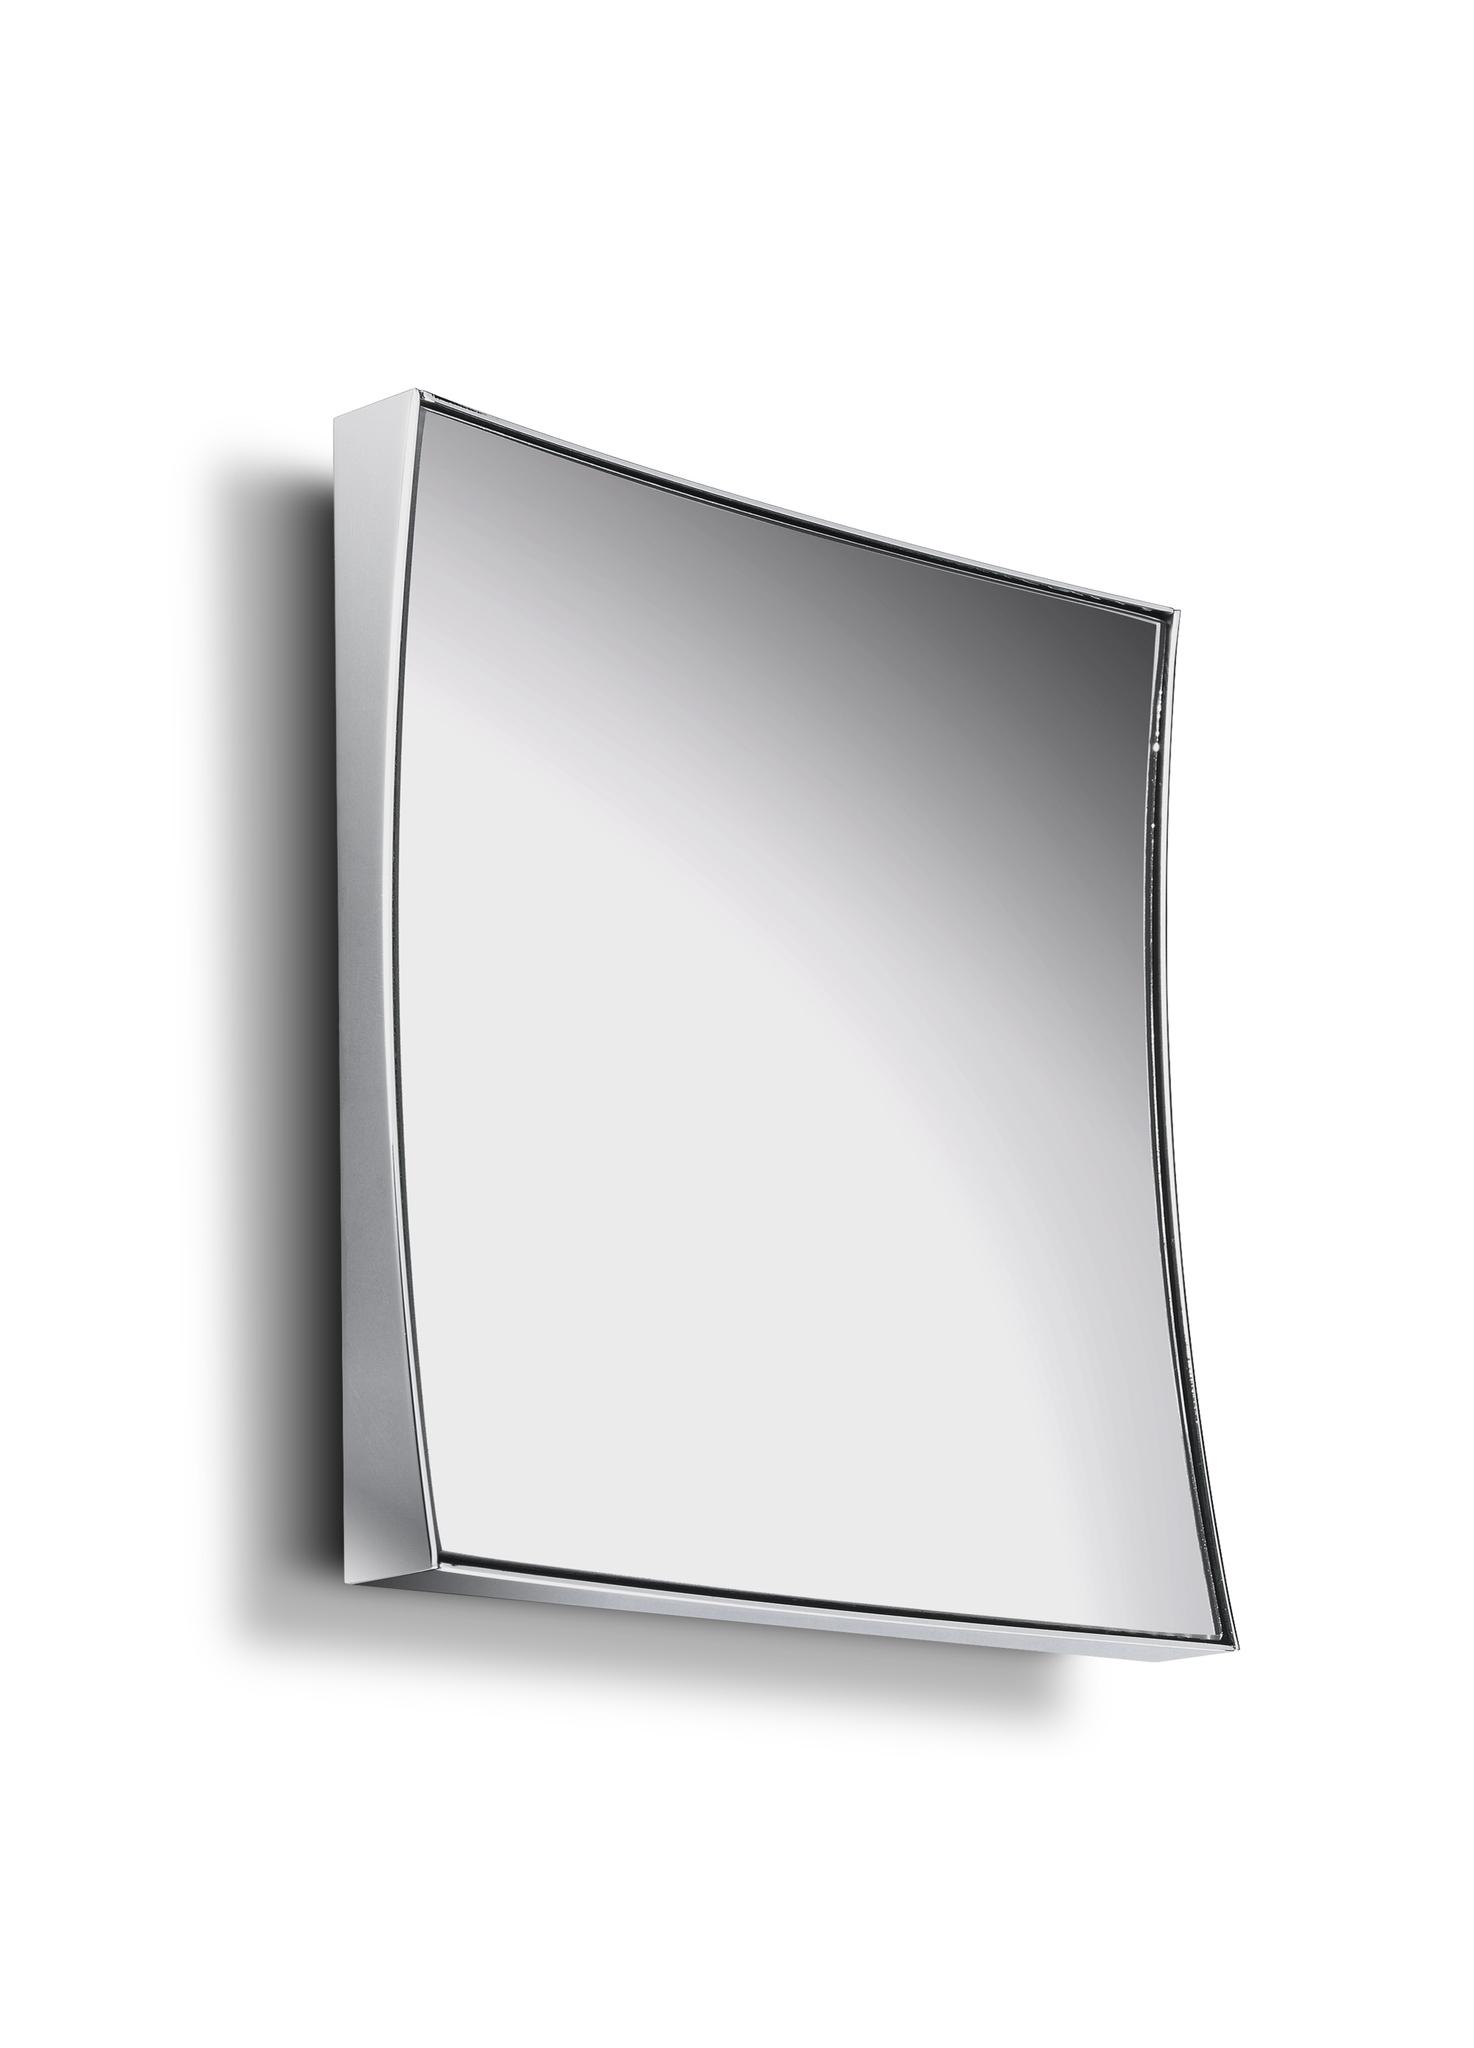 Зеркала Зеркало косметическое на присосках Windisch 99305O 3X elitnoe-zerkalo-kosmeticheskoe-na-prisoskah-99305-ot-windisch-ispaniya.jpg